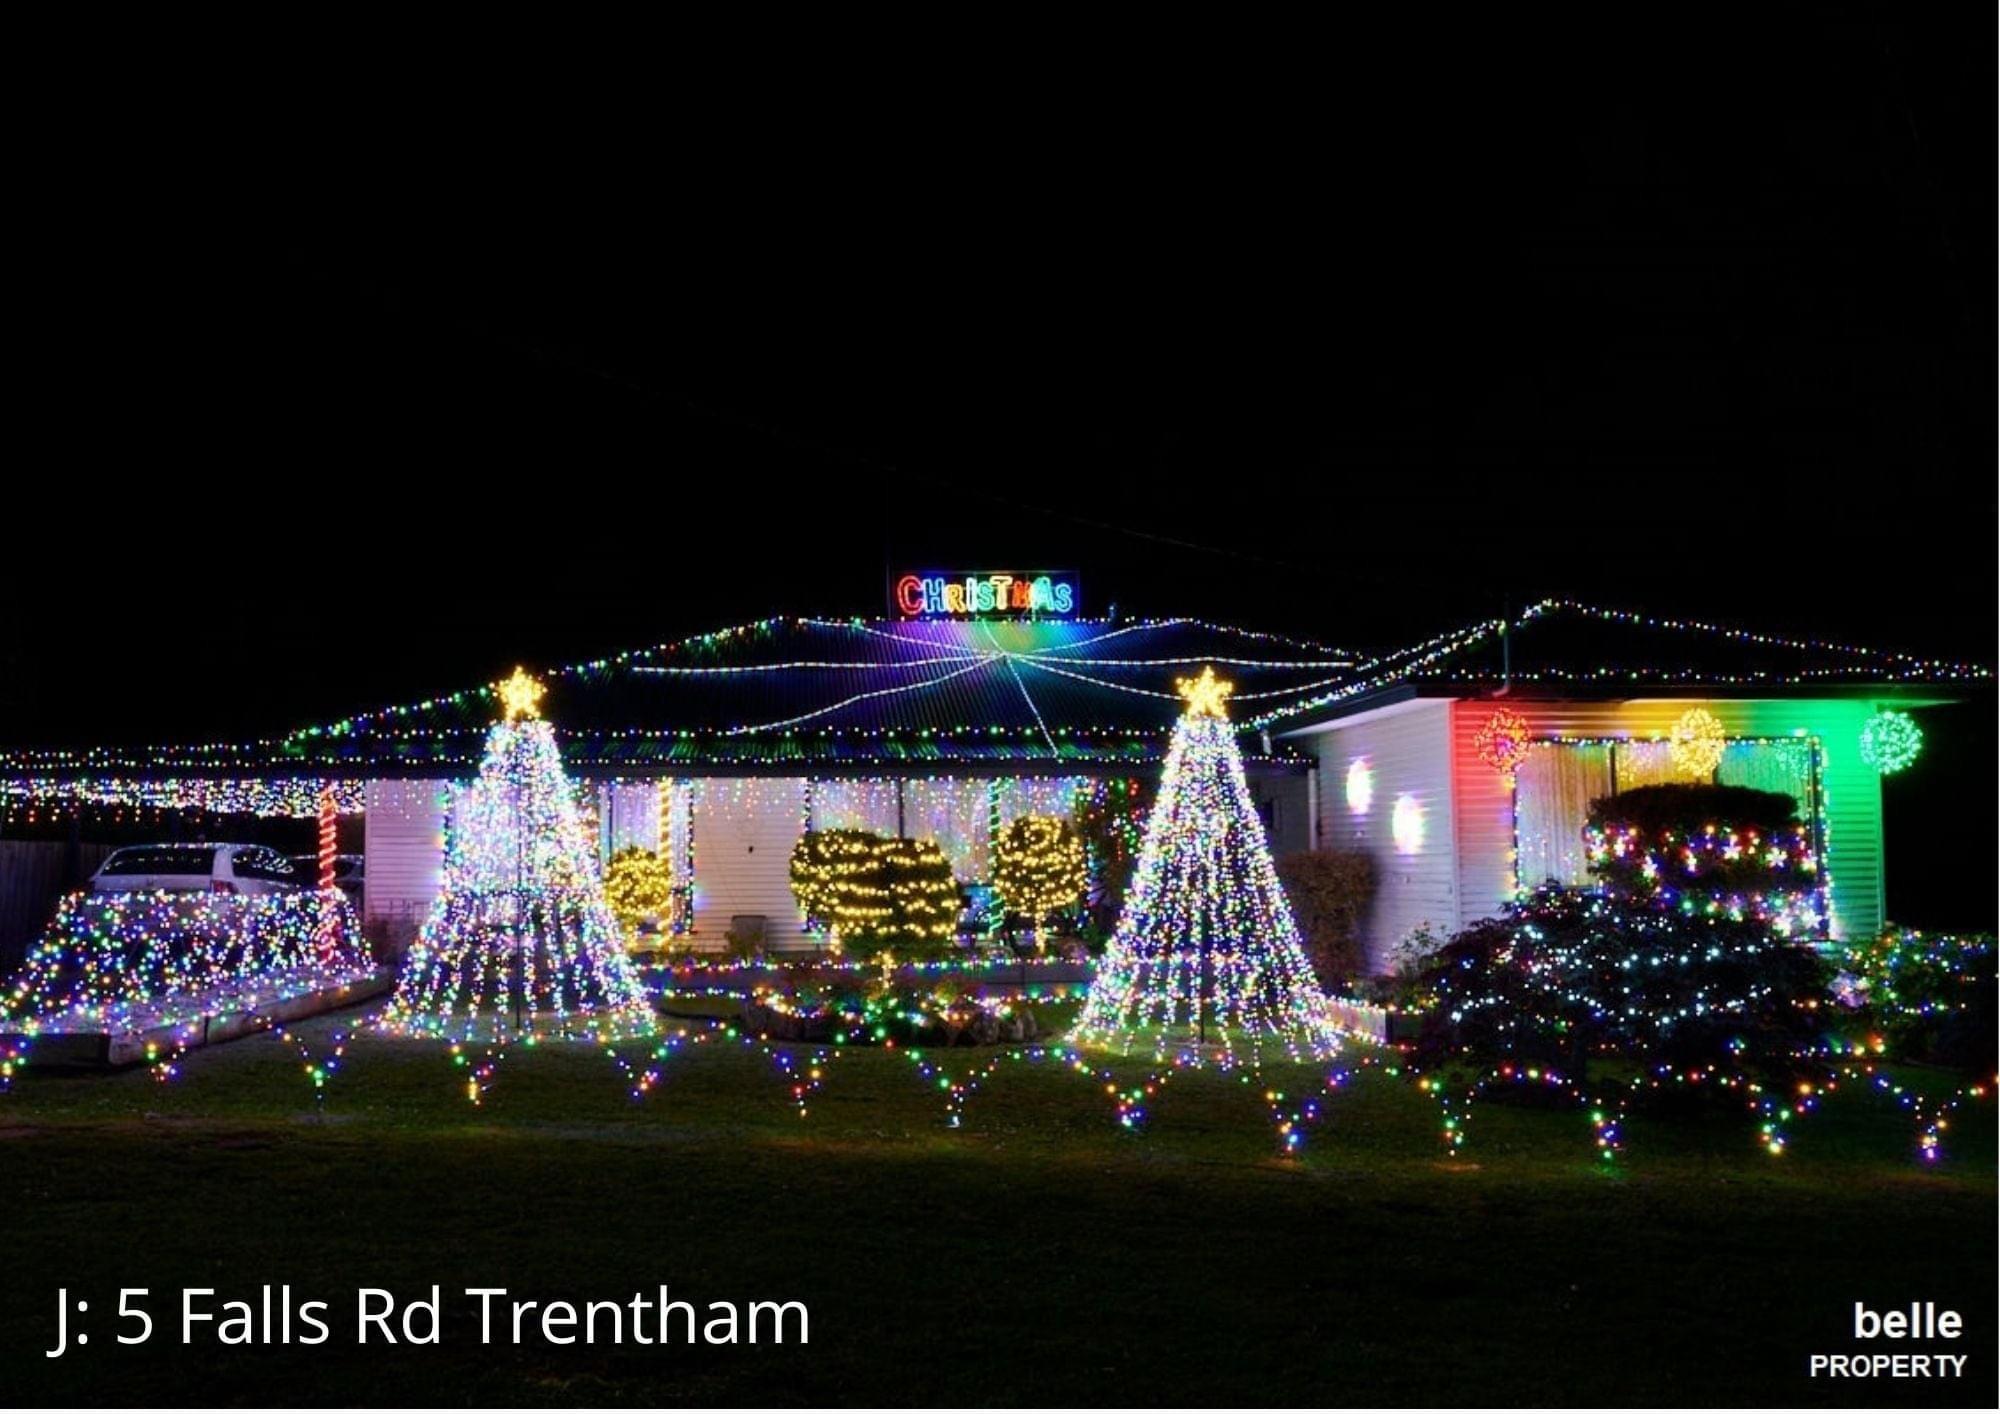 Lighting up Trentham